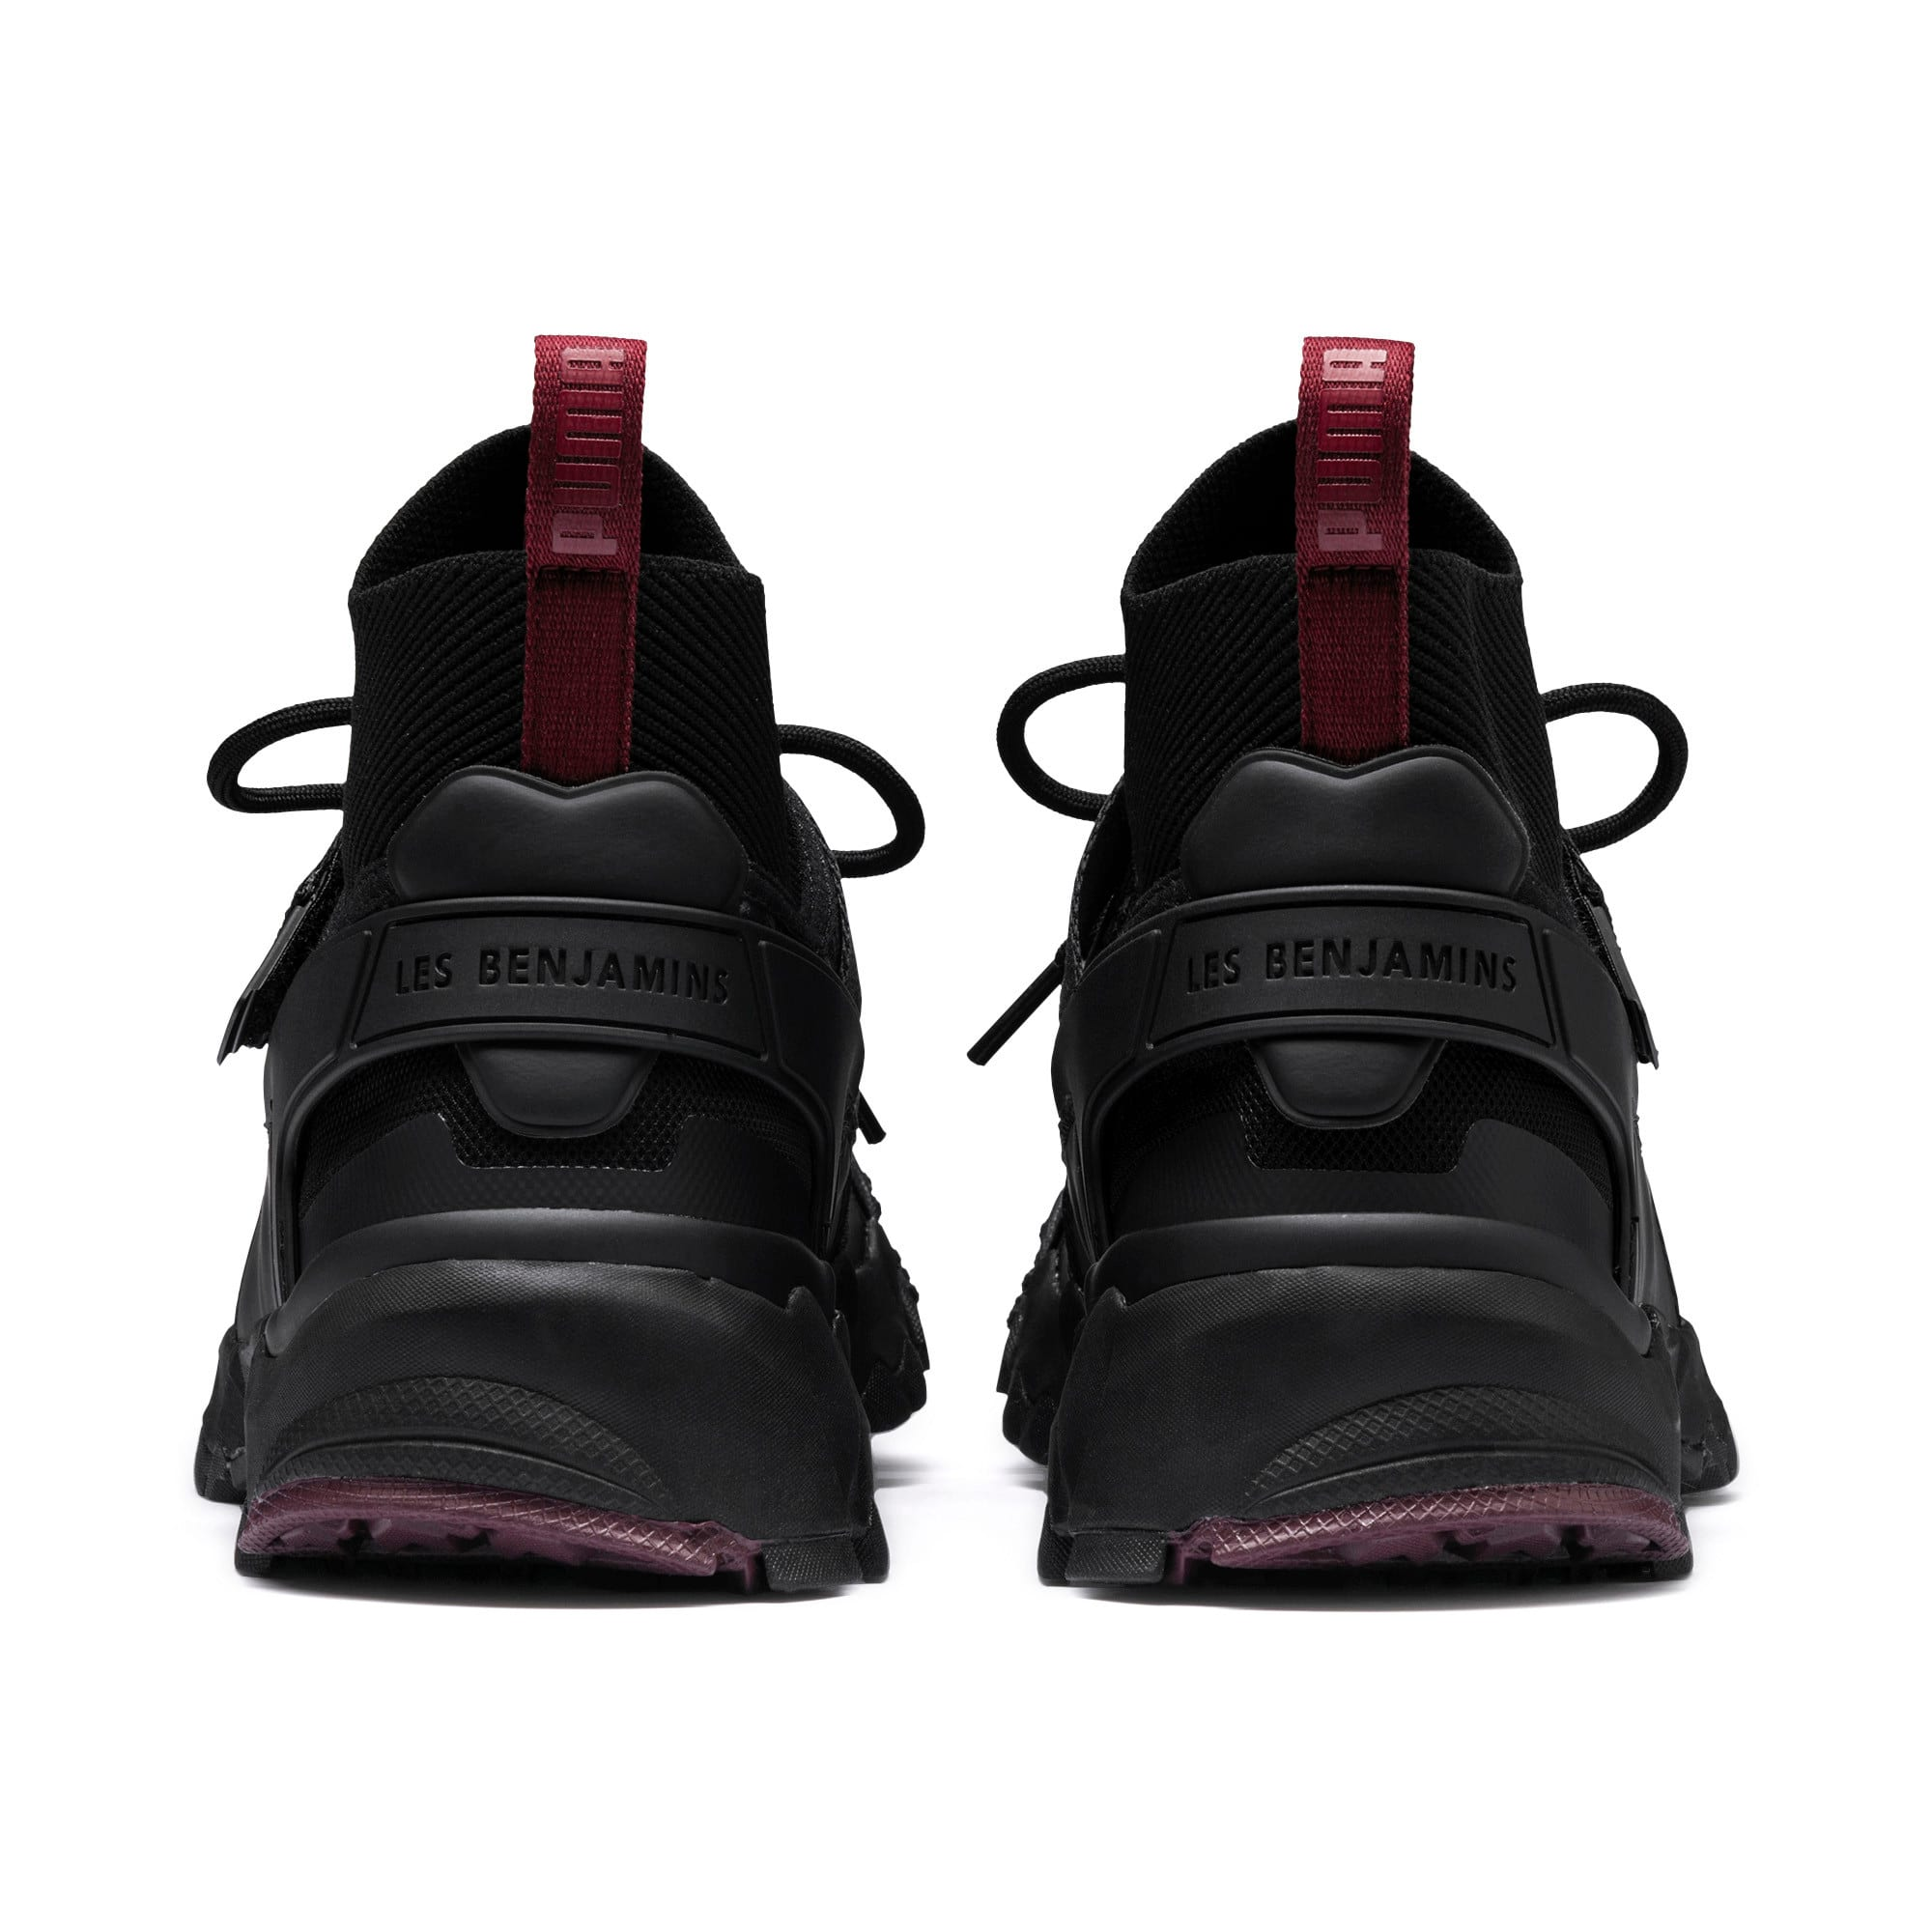 Thumbnail 4 van PUMA x LES BENJAMINS Trailfox schoenen, Puma Black, medium